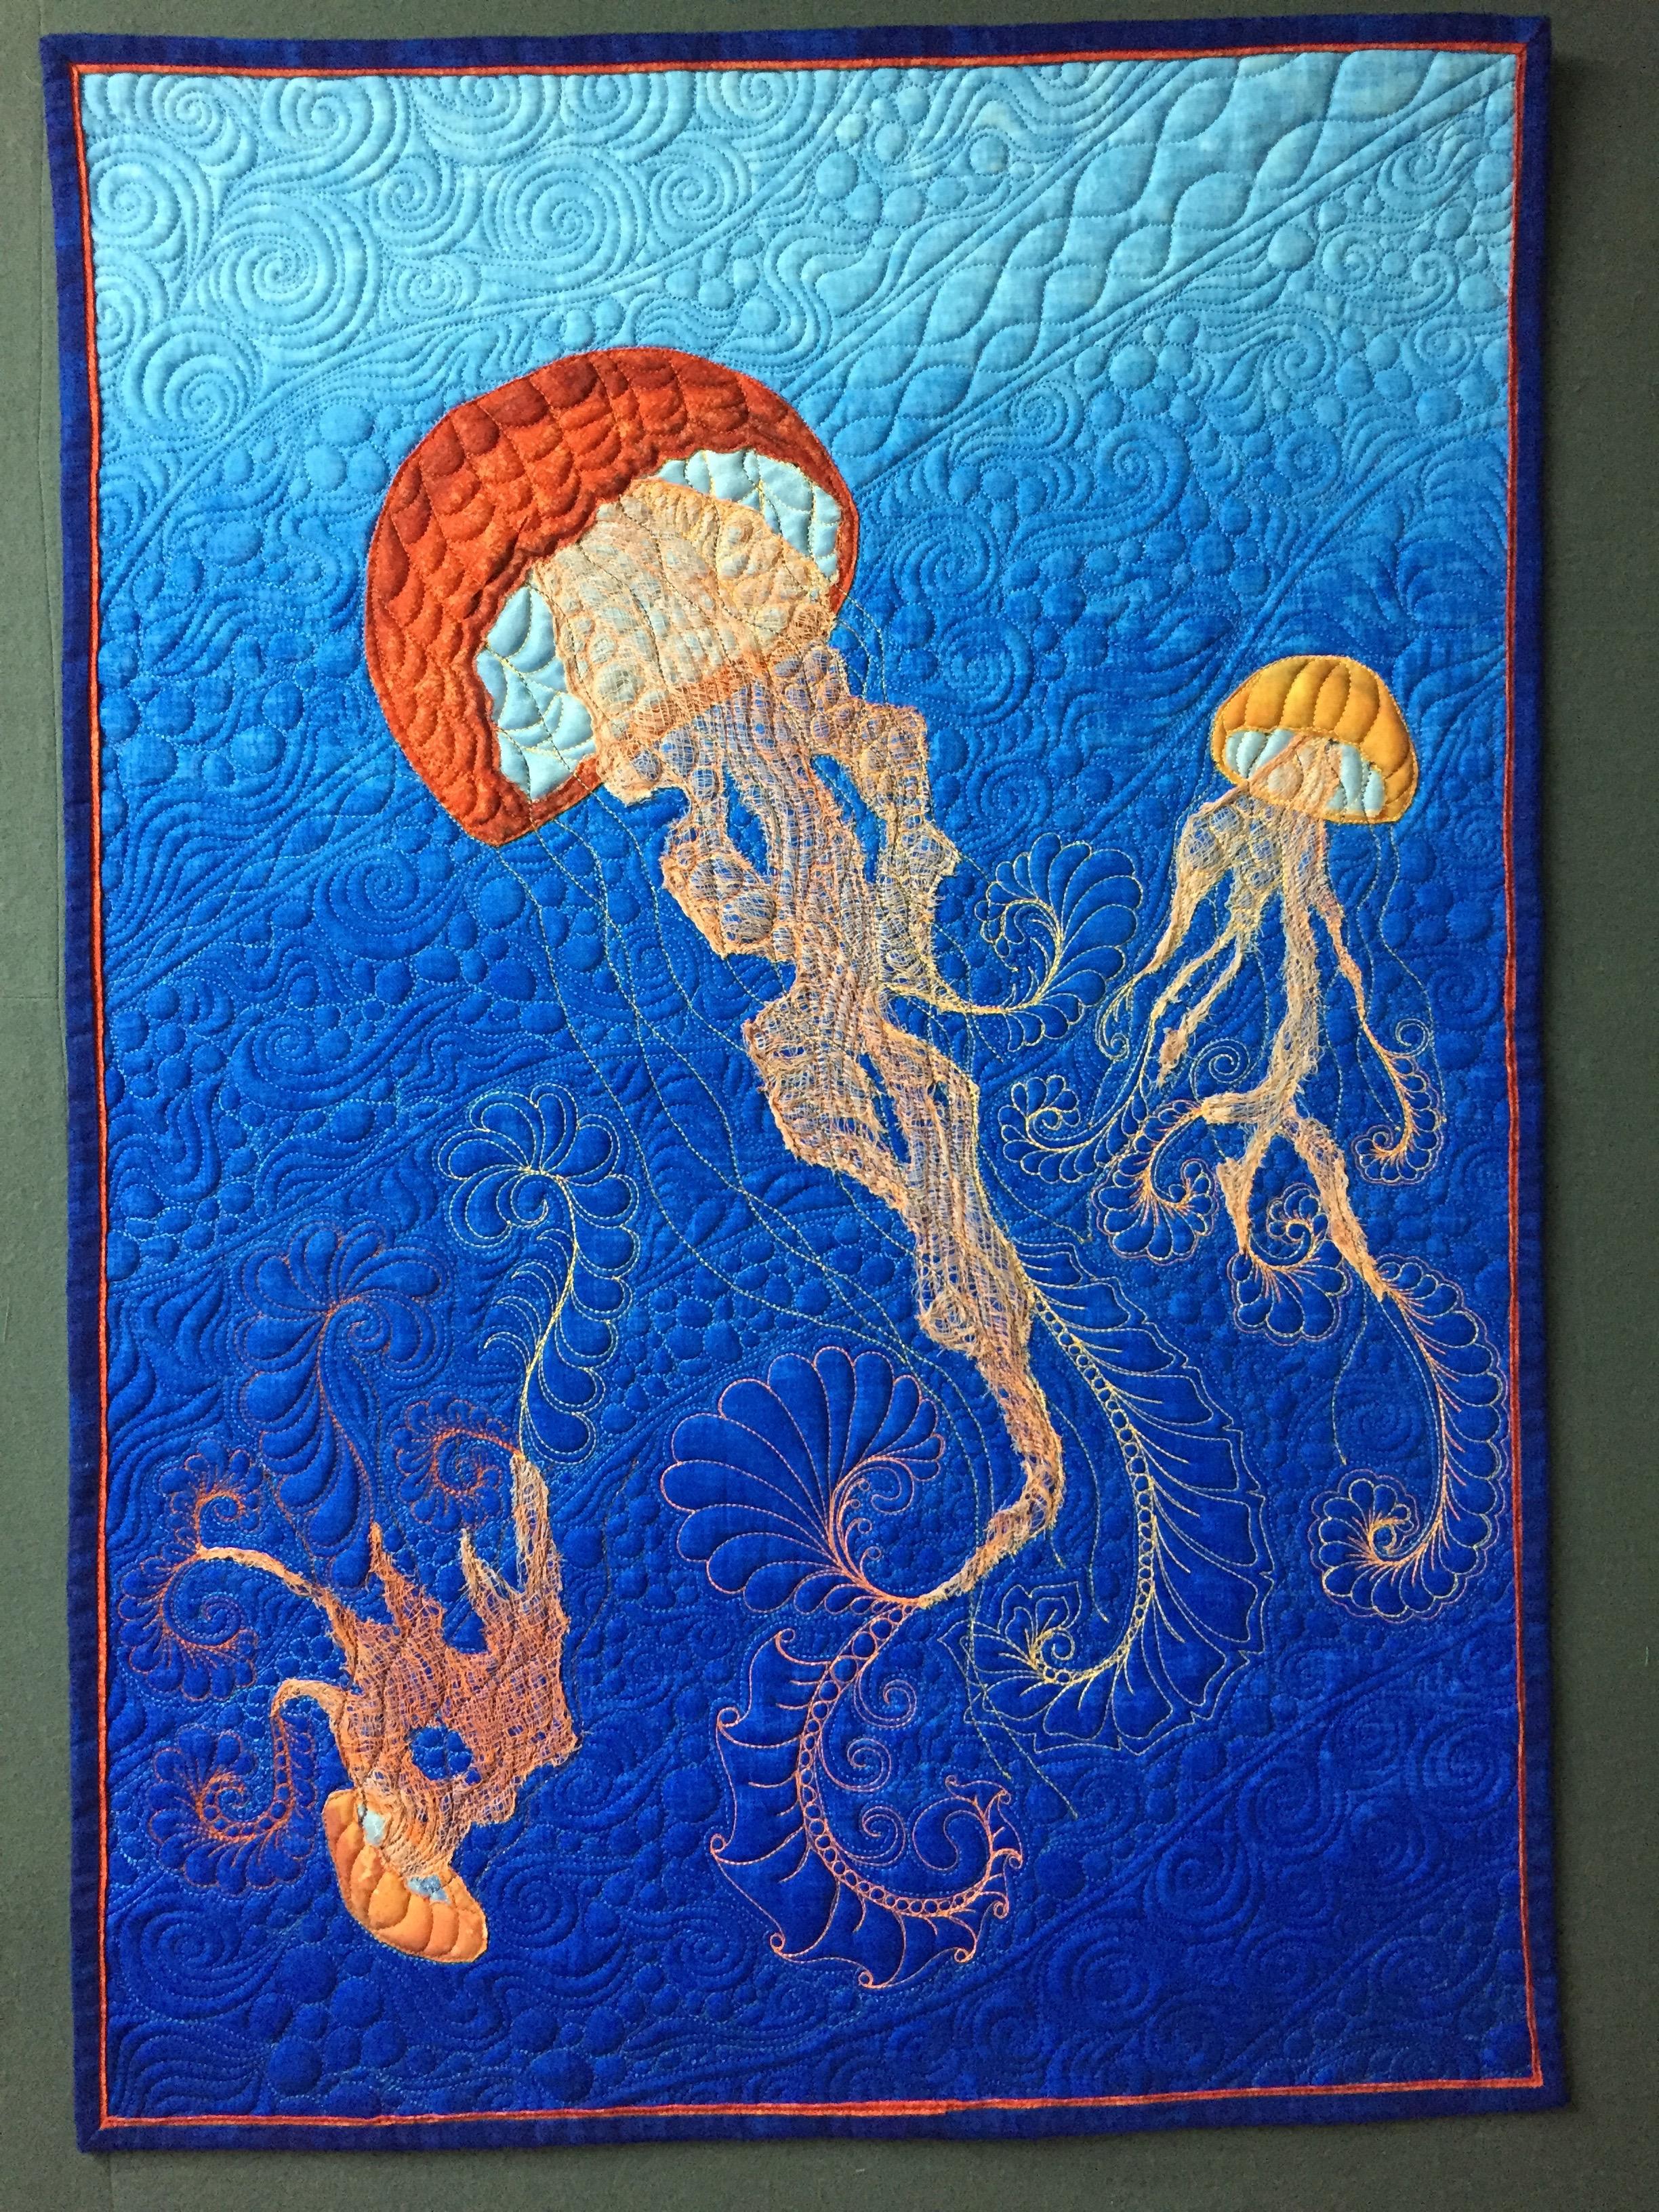 Jellies of the Sea (2017)